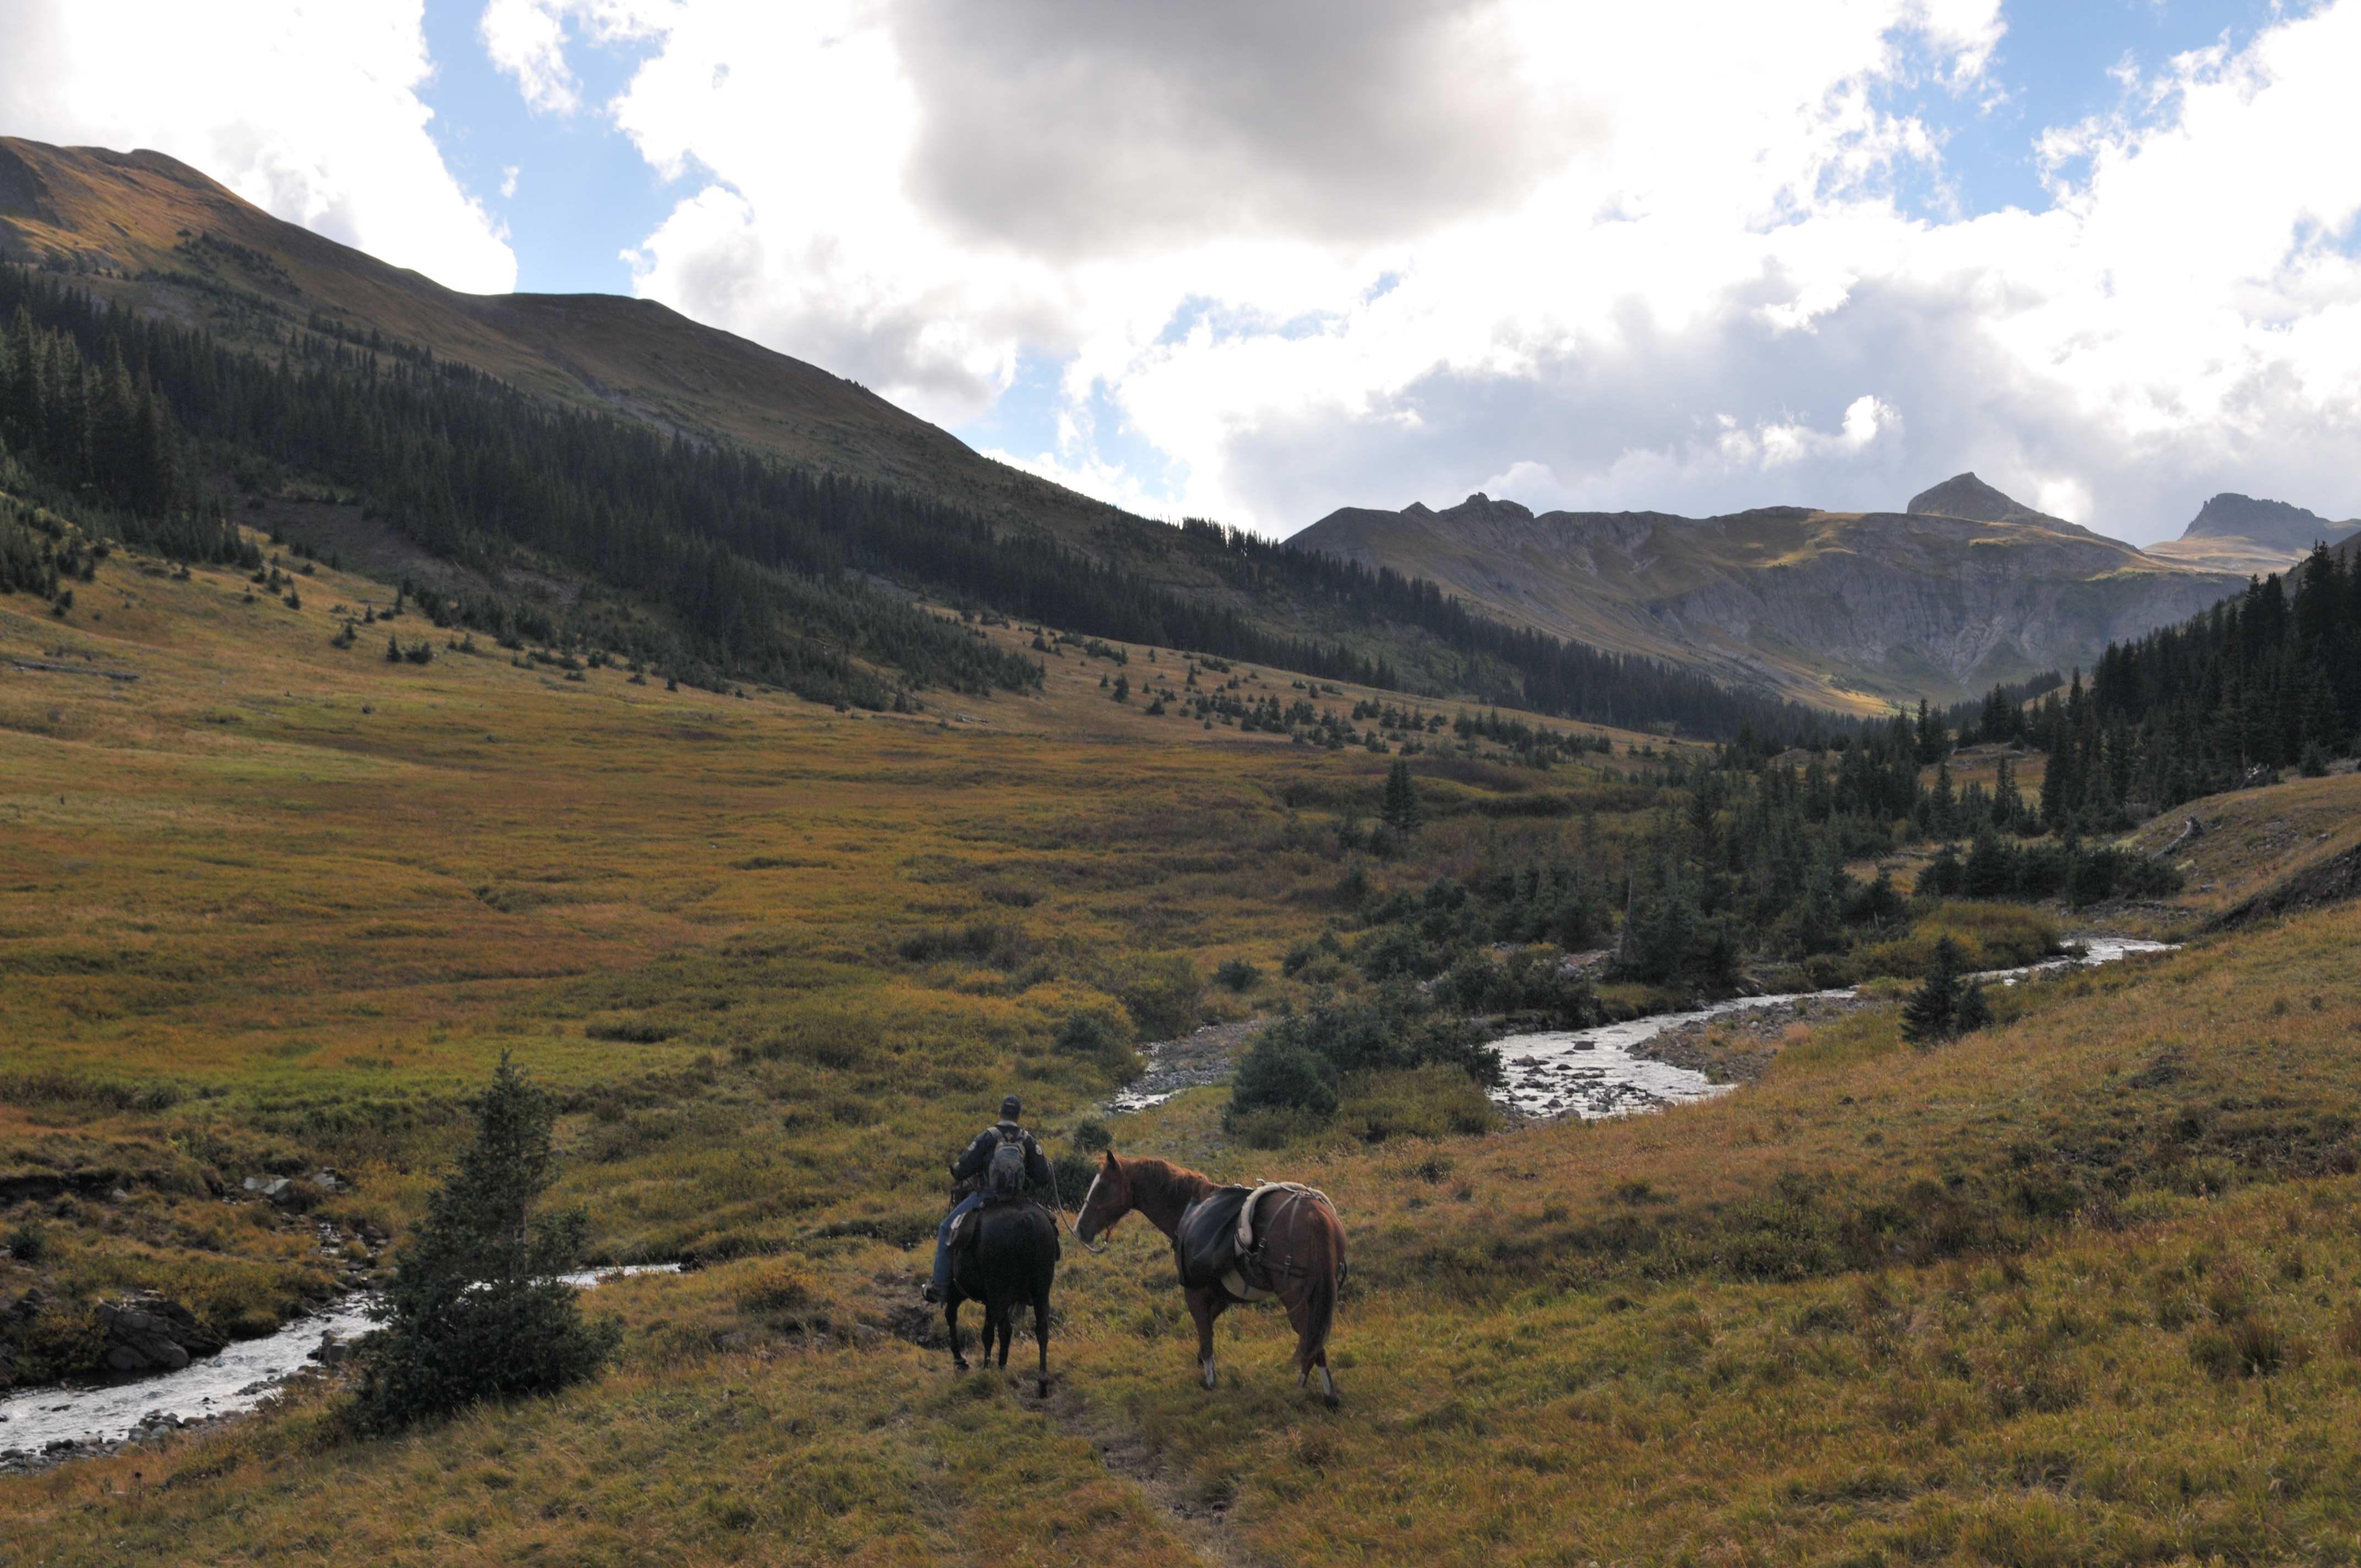 heading out on horseback